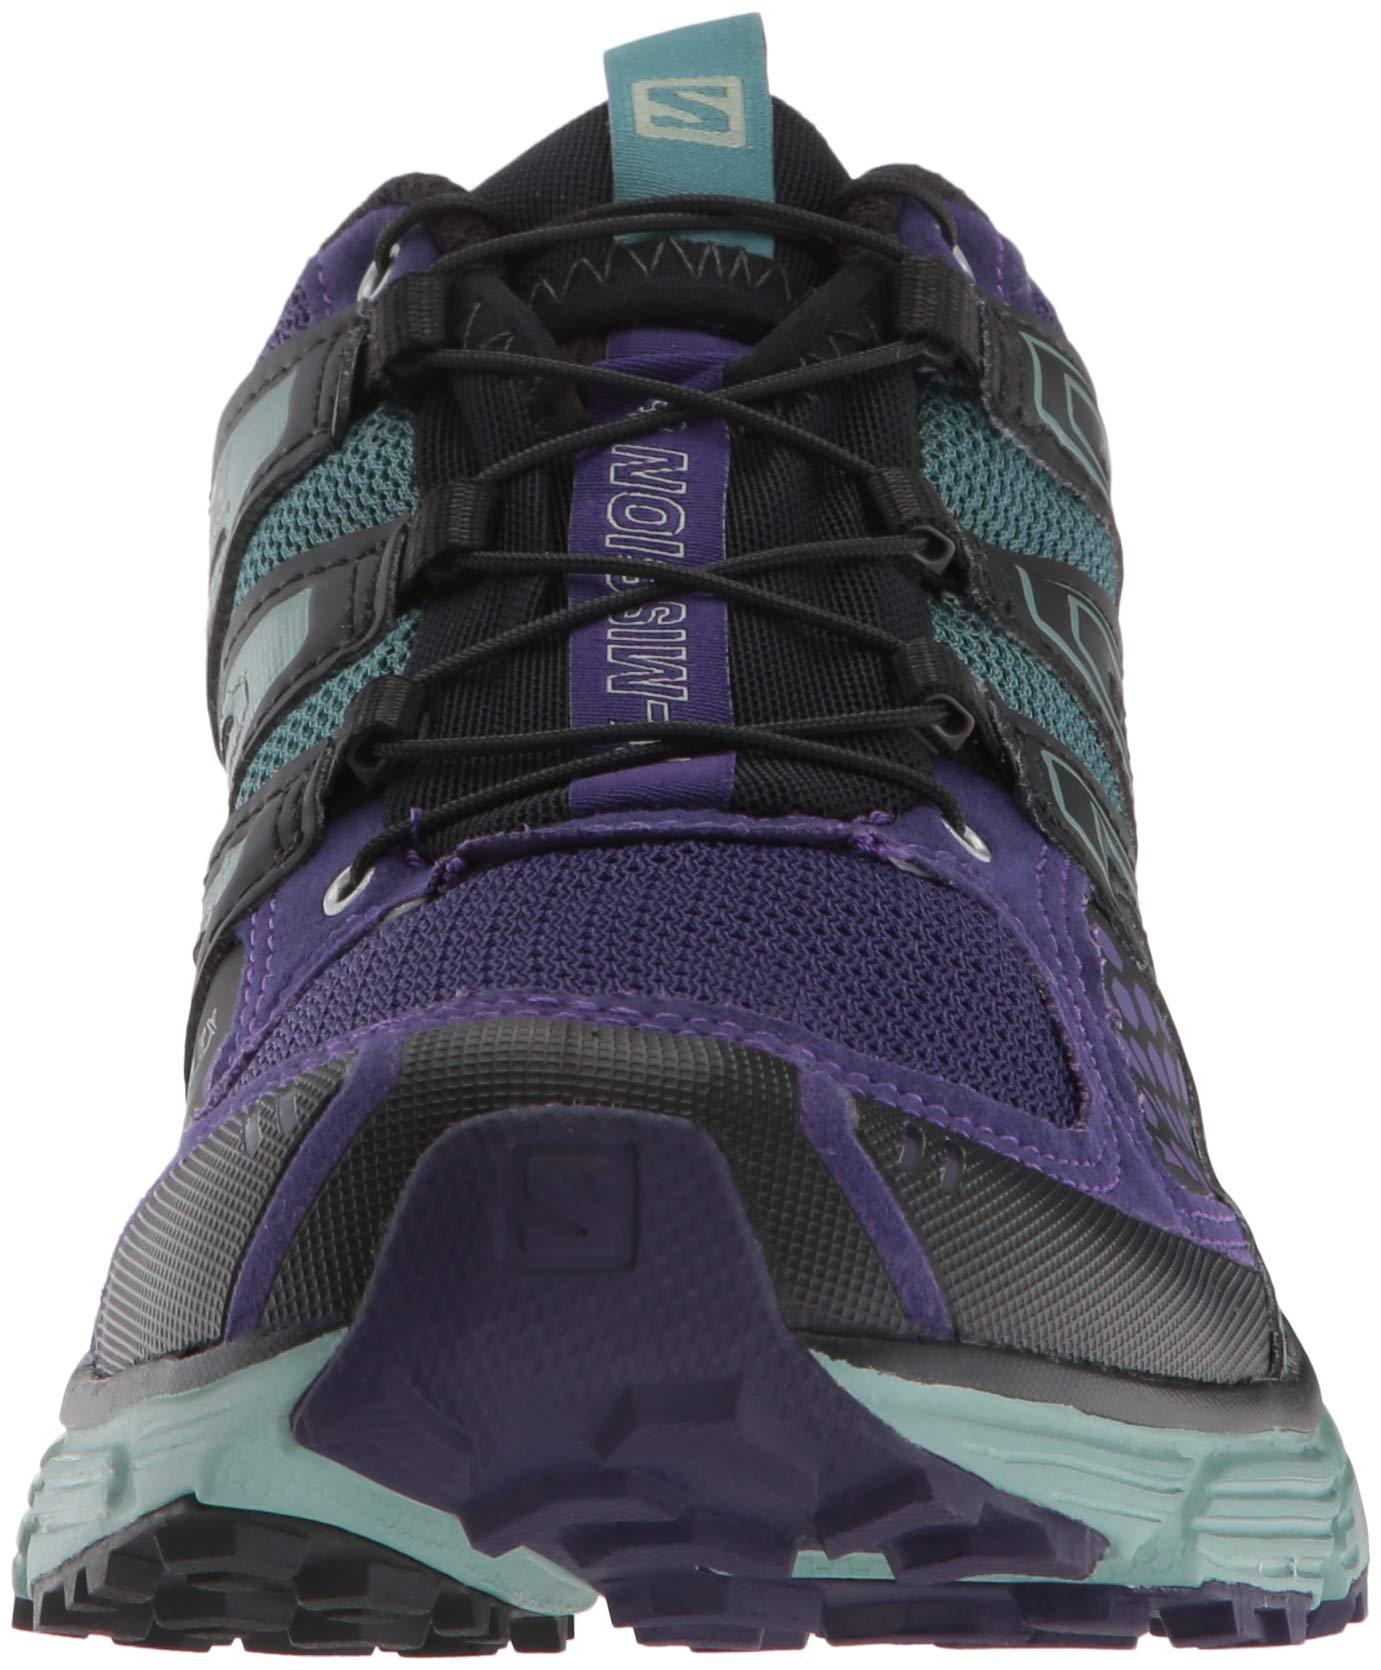 Salomon Women's X-Mission 3W Trail Running Shoe